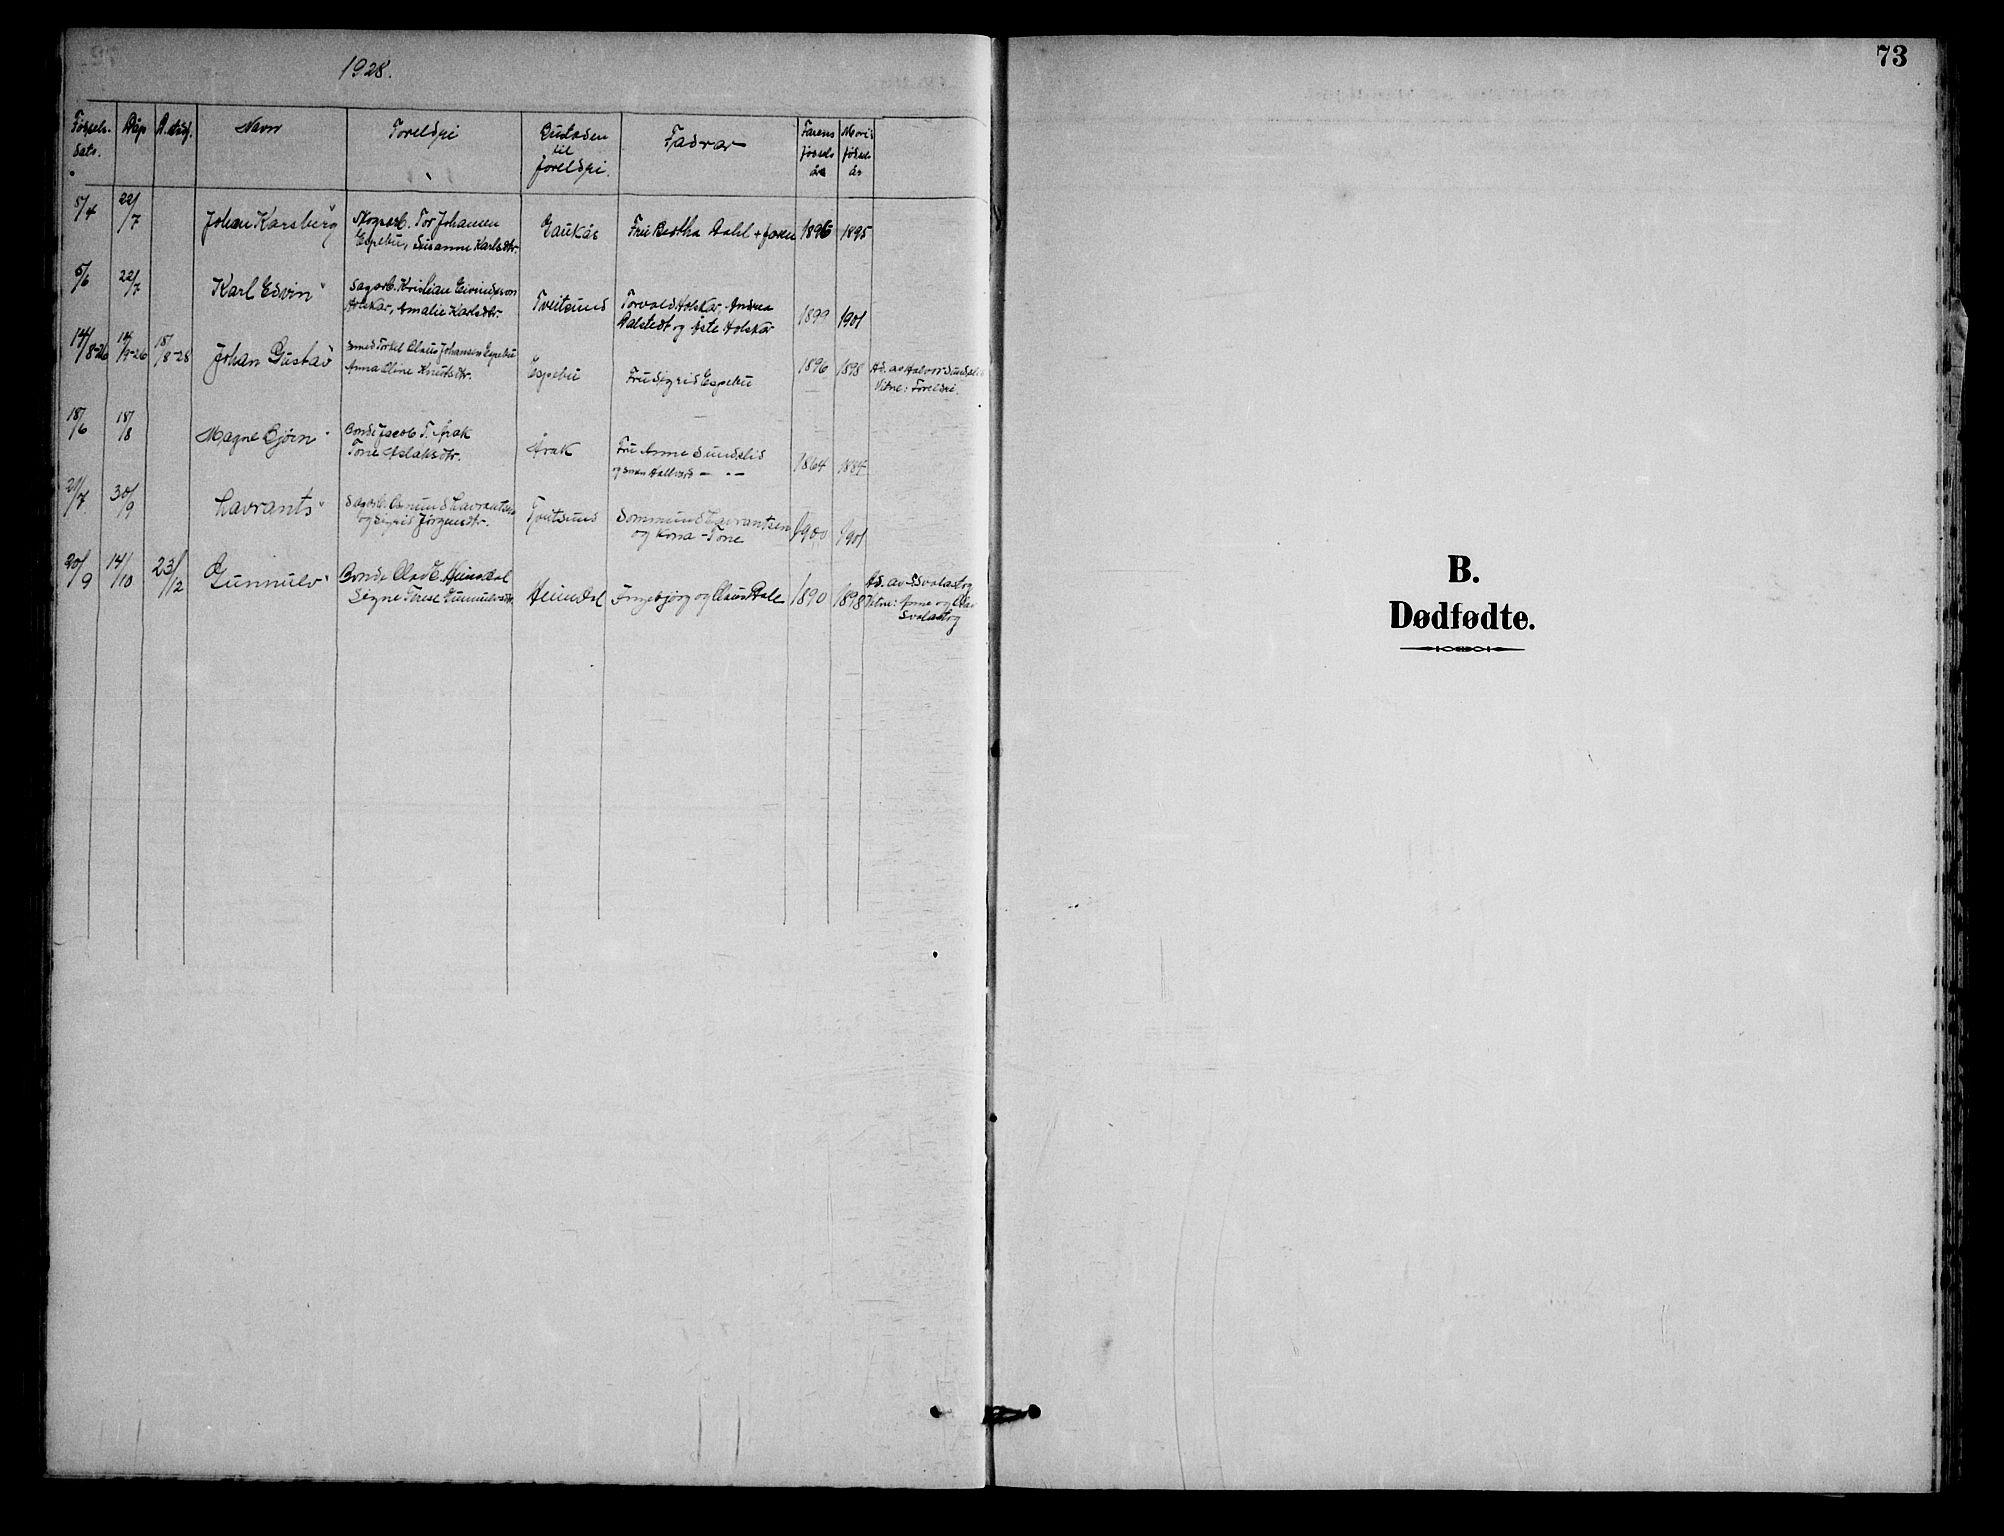 SAKO, Nissedal kirkebøker, G/Gb/L0003: Klokkerbok nr. II 3, 1893-1928, s. 73